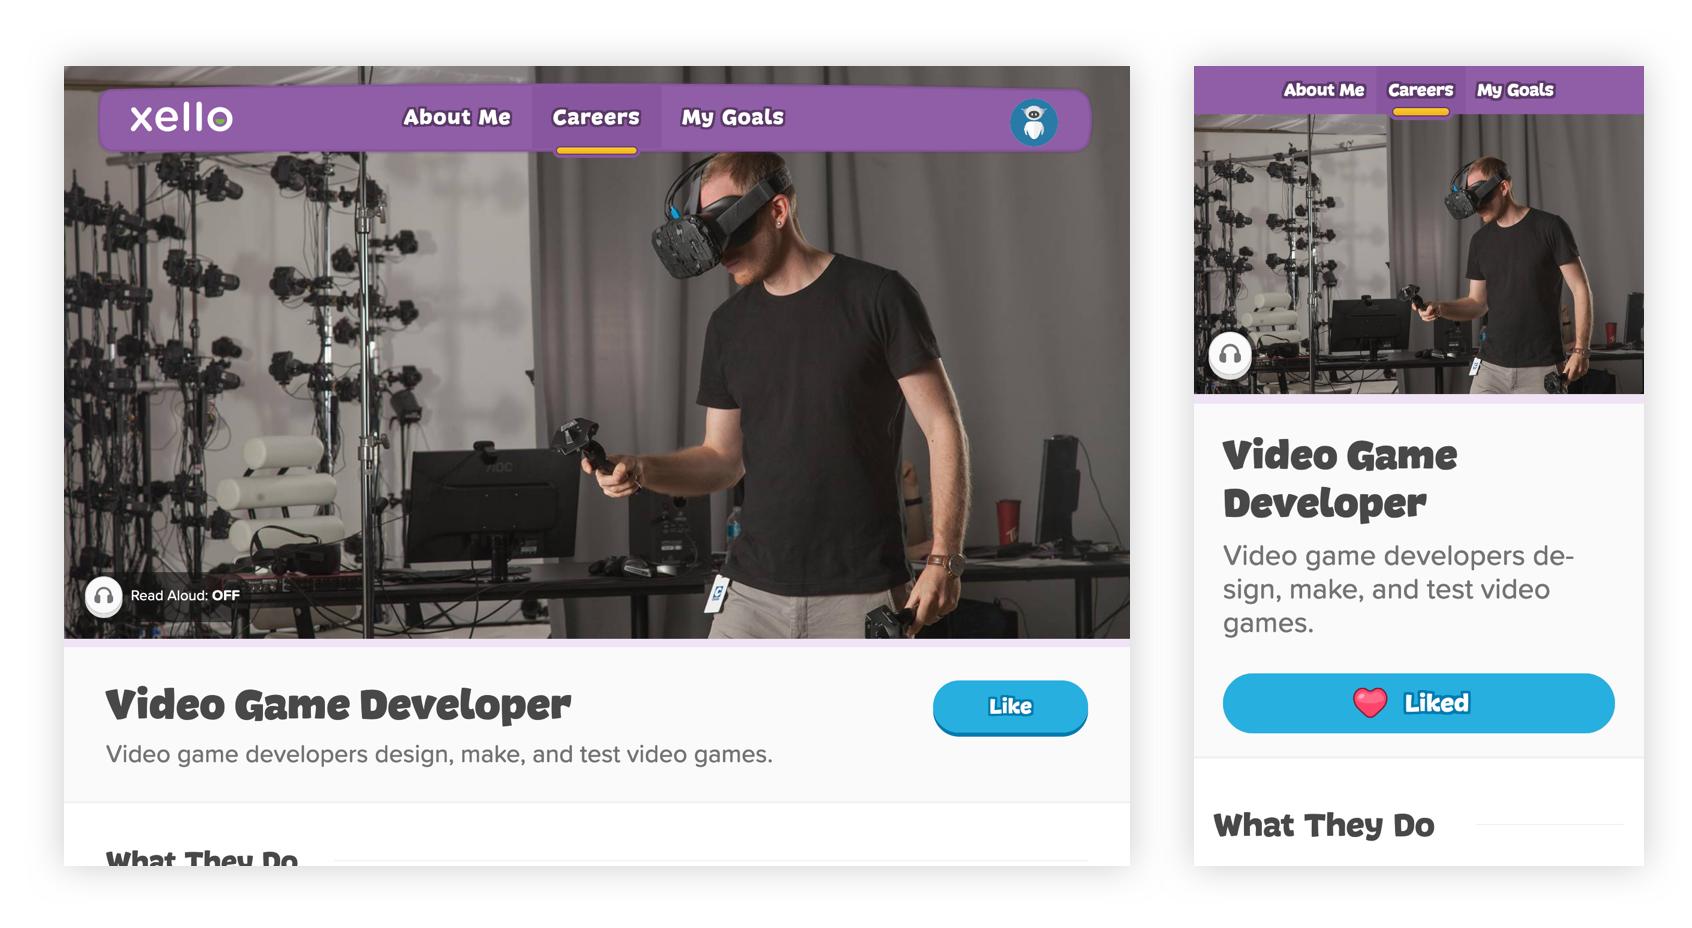 Final screenshots of Video Game Developer profile